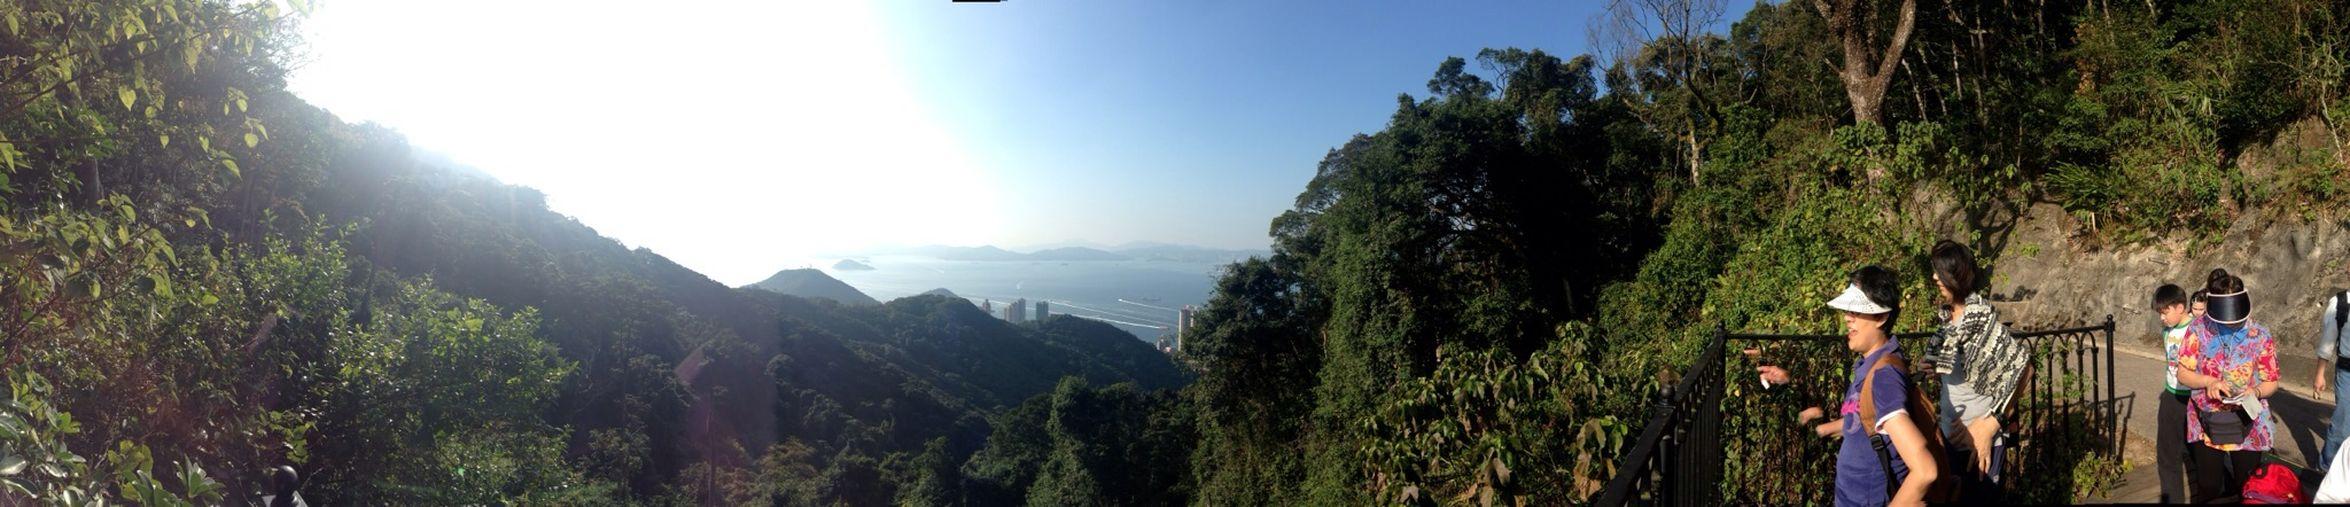 Hong Kong Mountain Goat Nature Walking